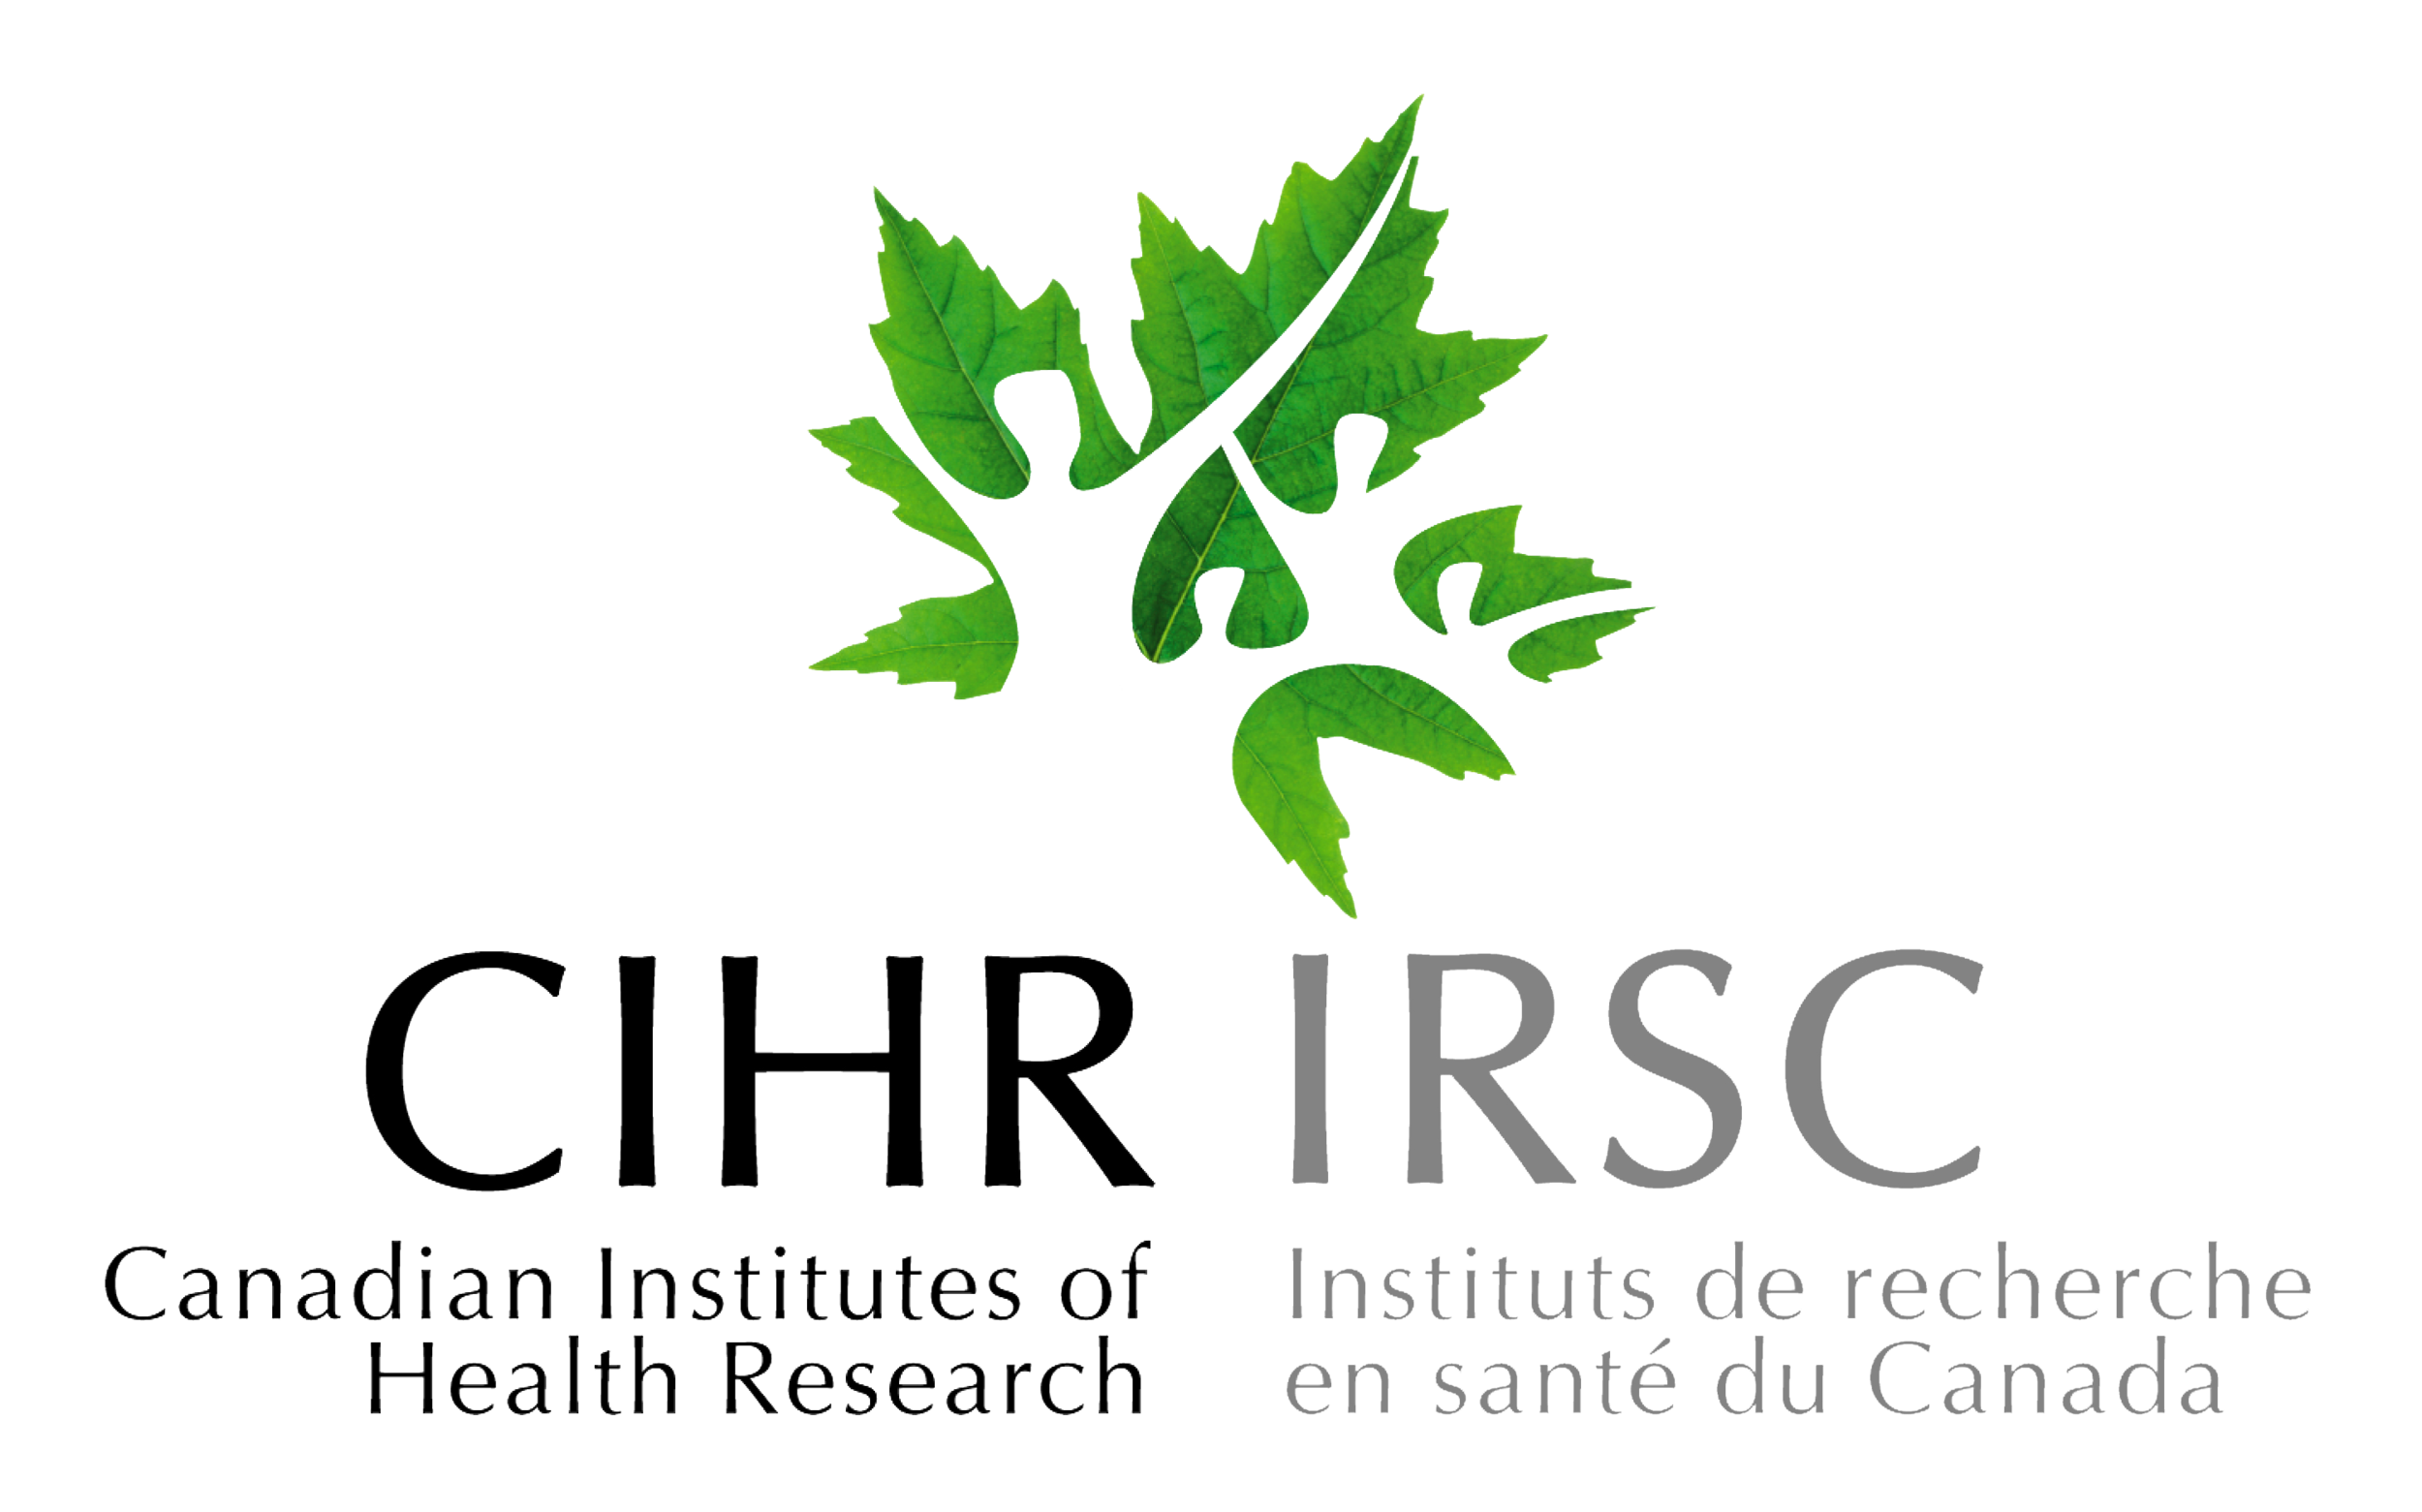 logo-eng CIHR.jpeg